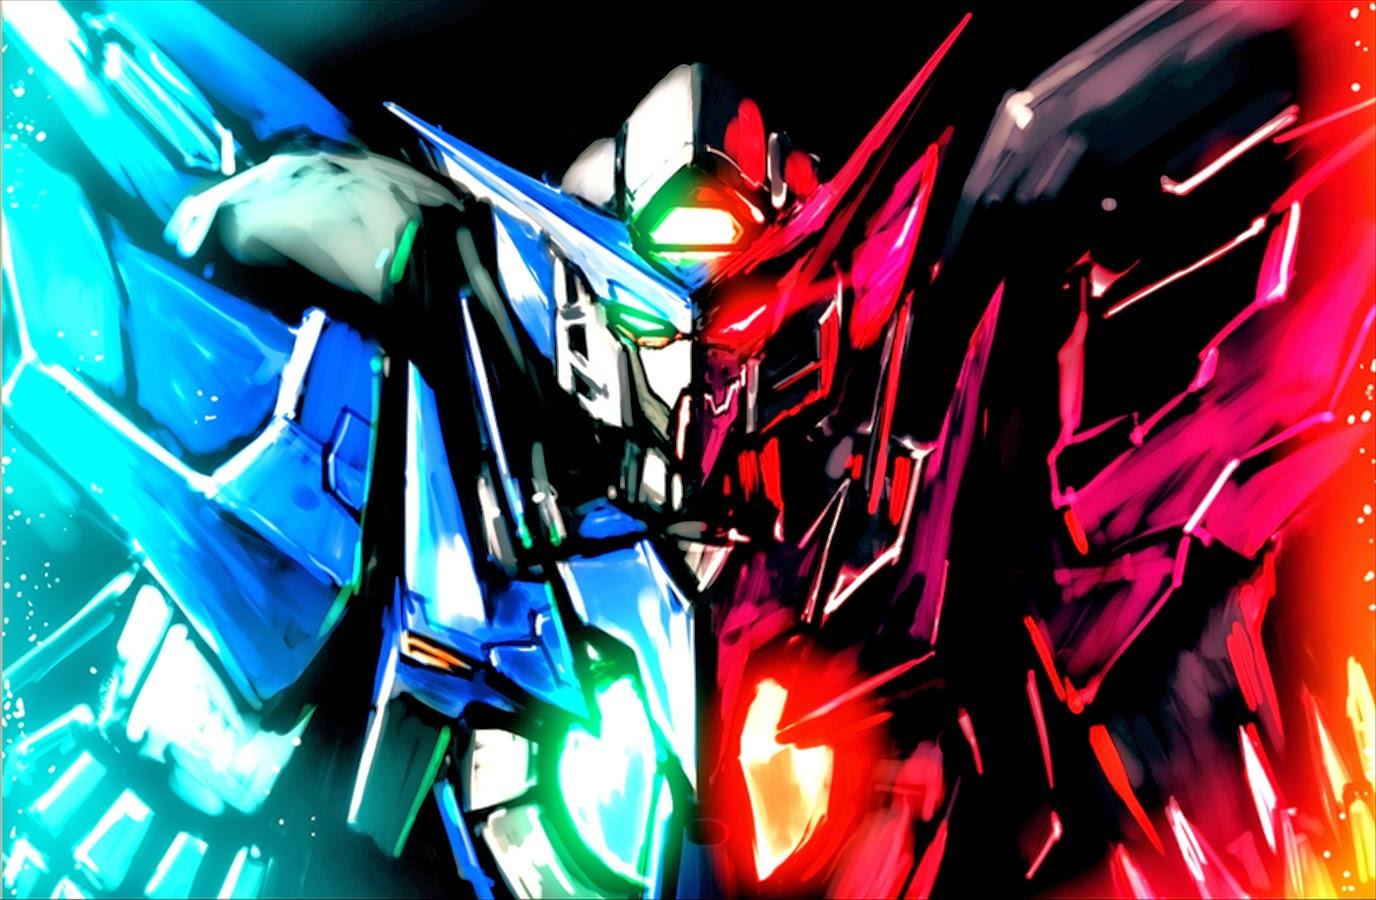 Gundam exia wallpaper sf wallpaper gundam exia wallpaper wallpapersafari voltagebd Images